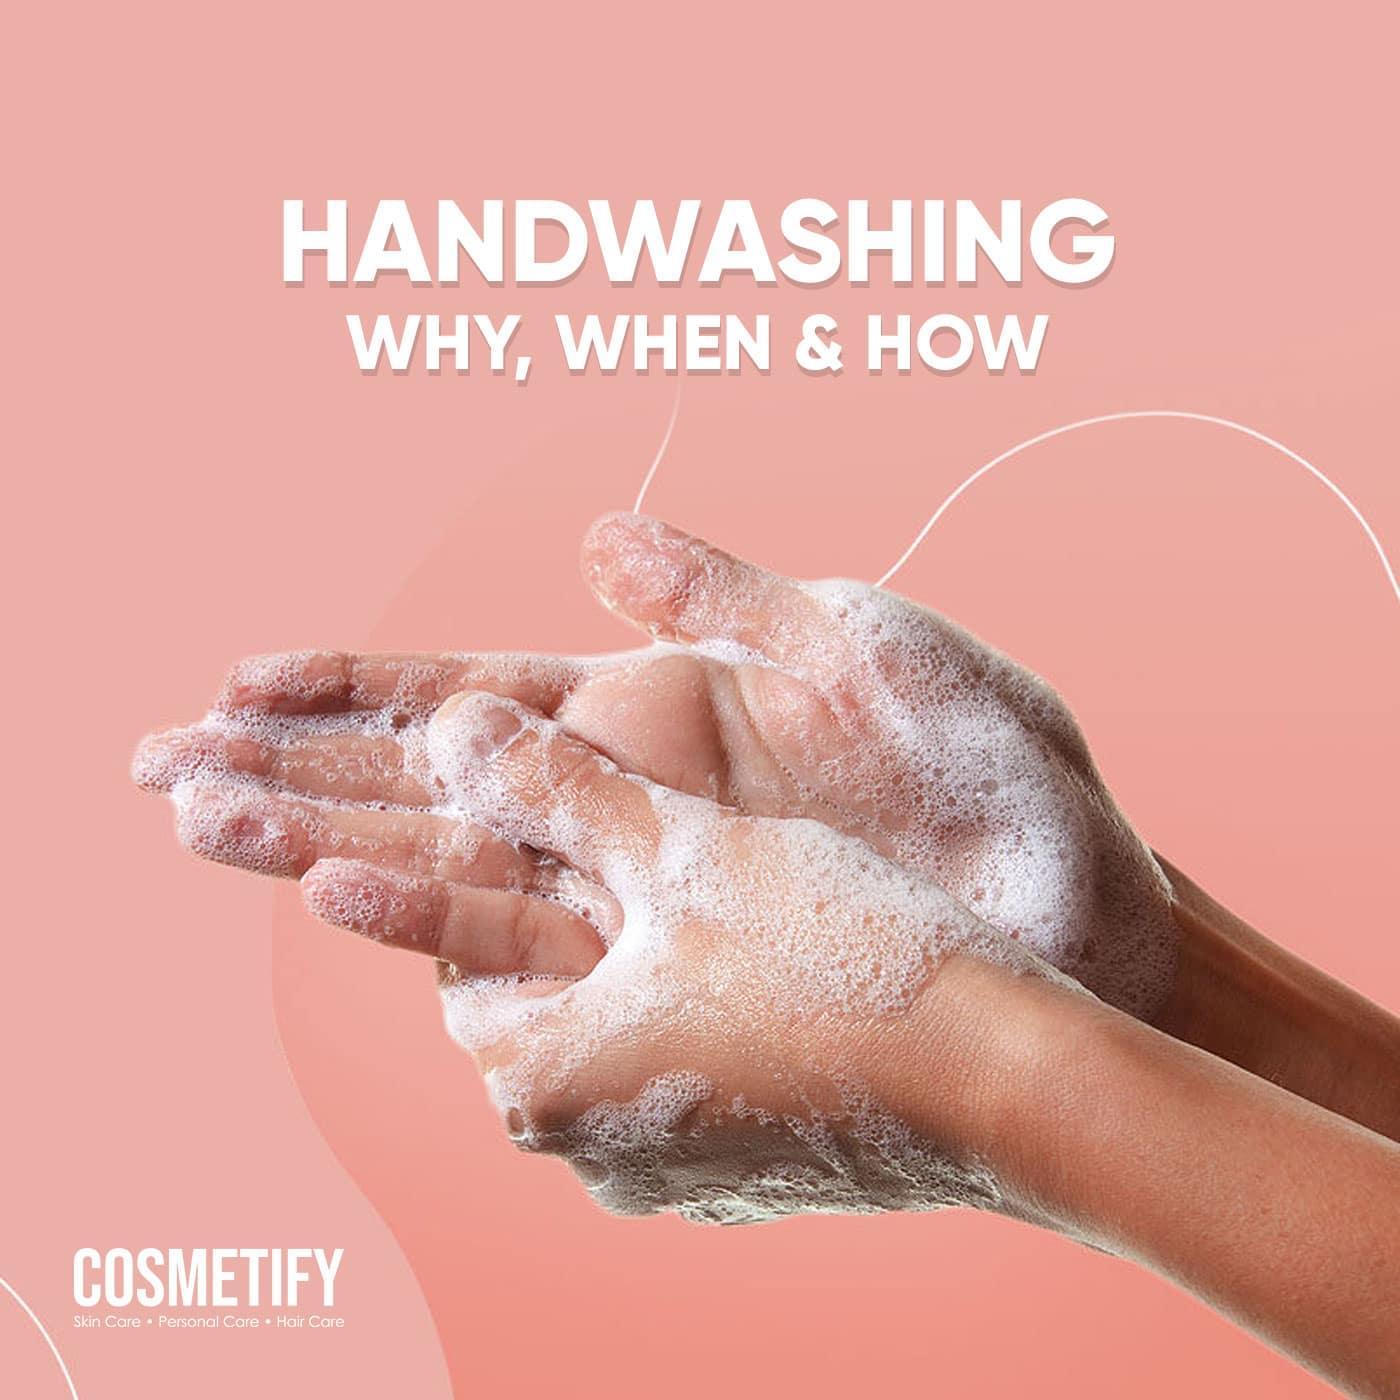 Handwashing: Why, When & How?